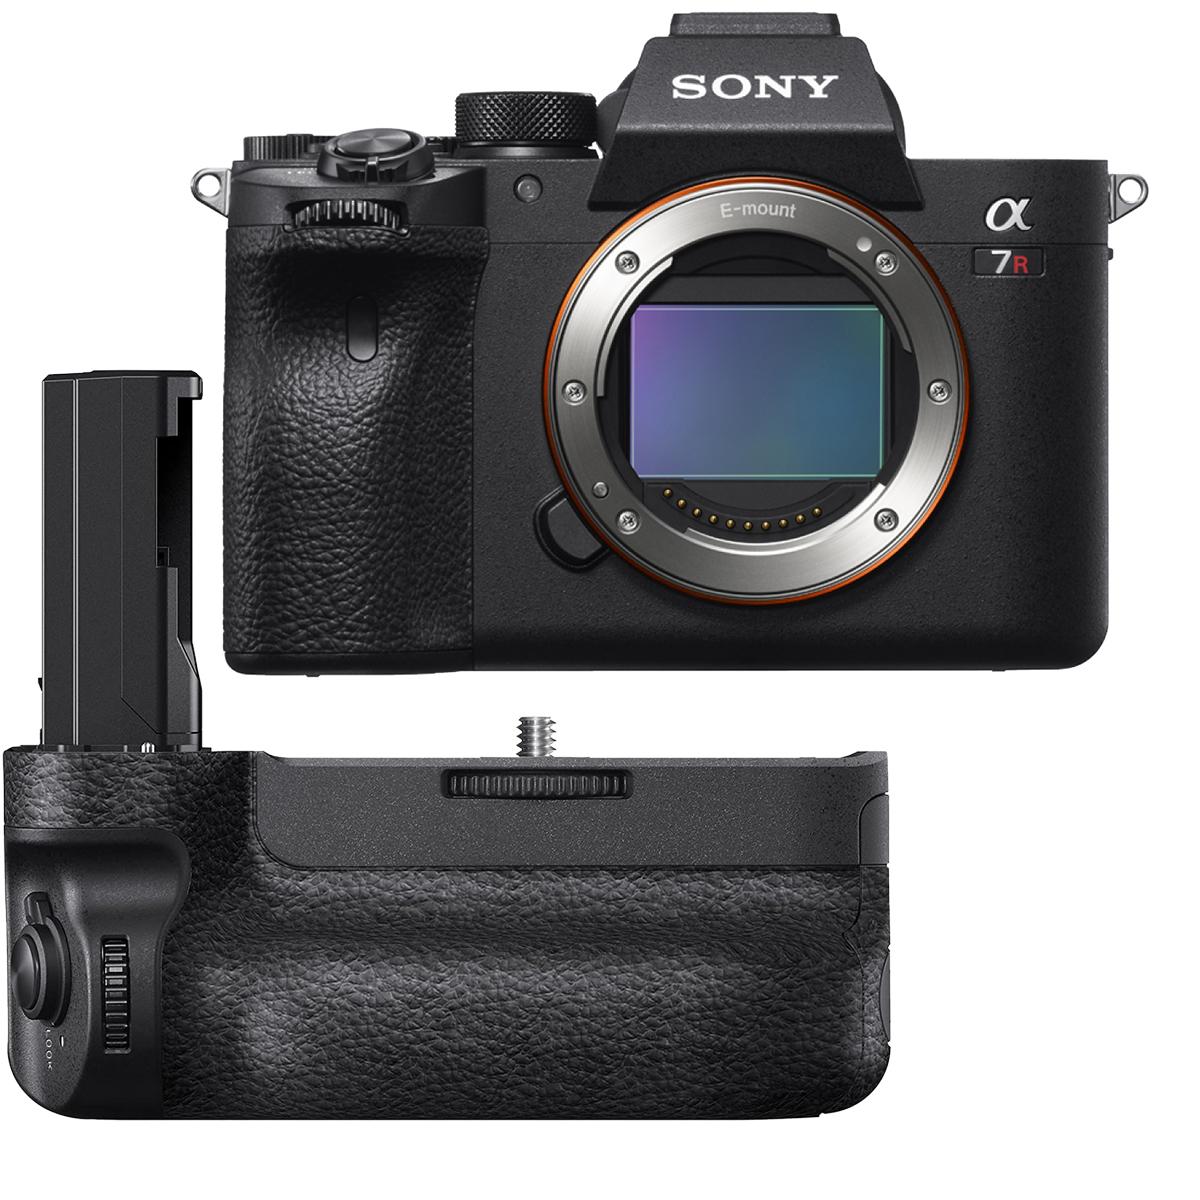 Sony Alpha 7R III Systemkamera + VG-C 3 EM Batteriegriff (exkl. 540€ Cashback = 1959€)